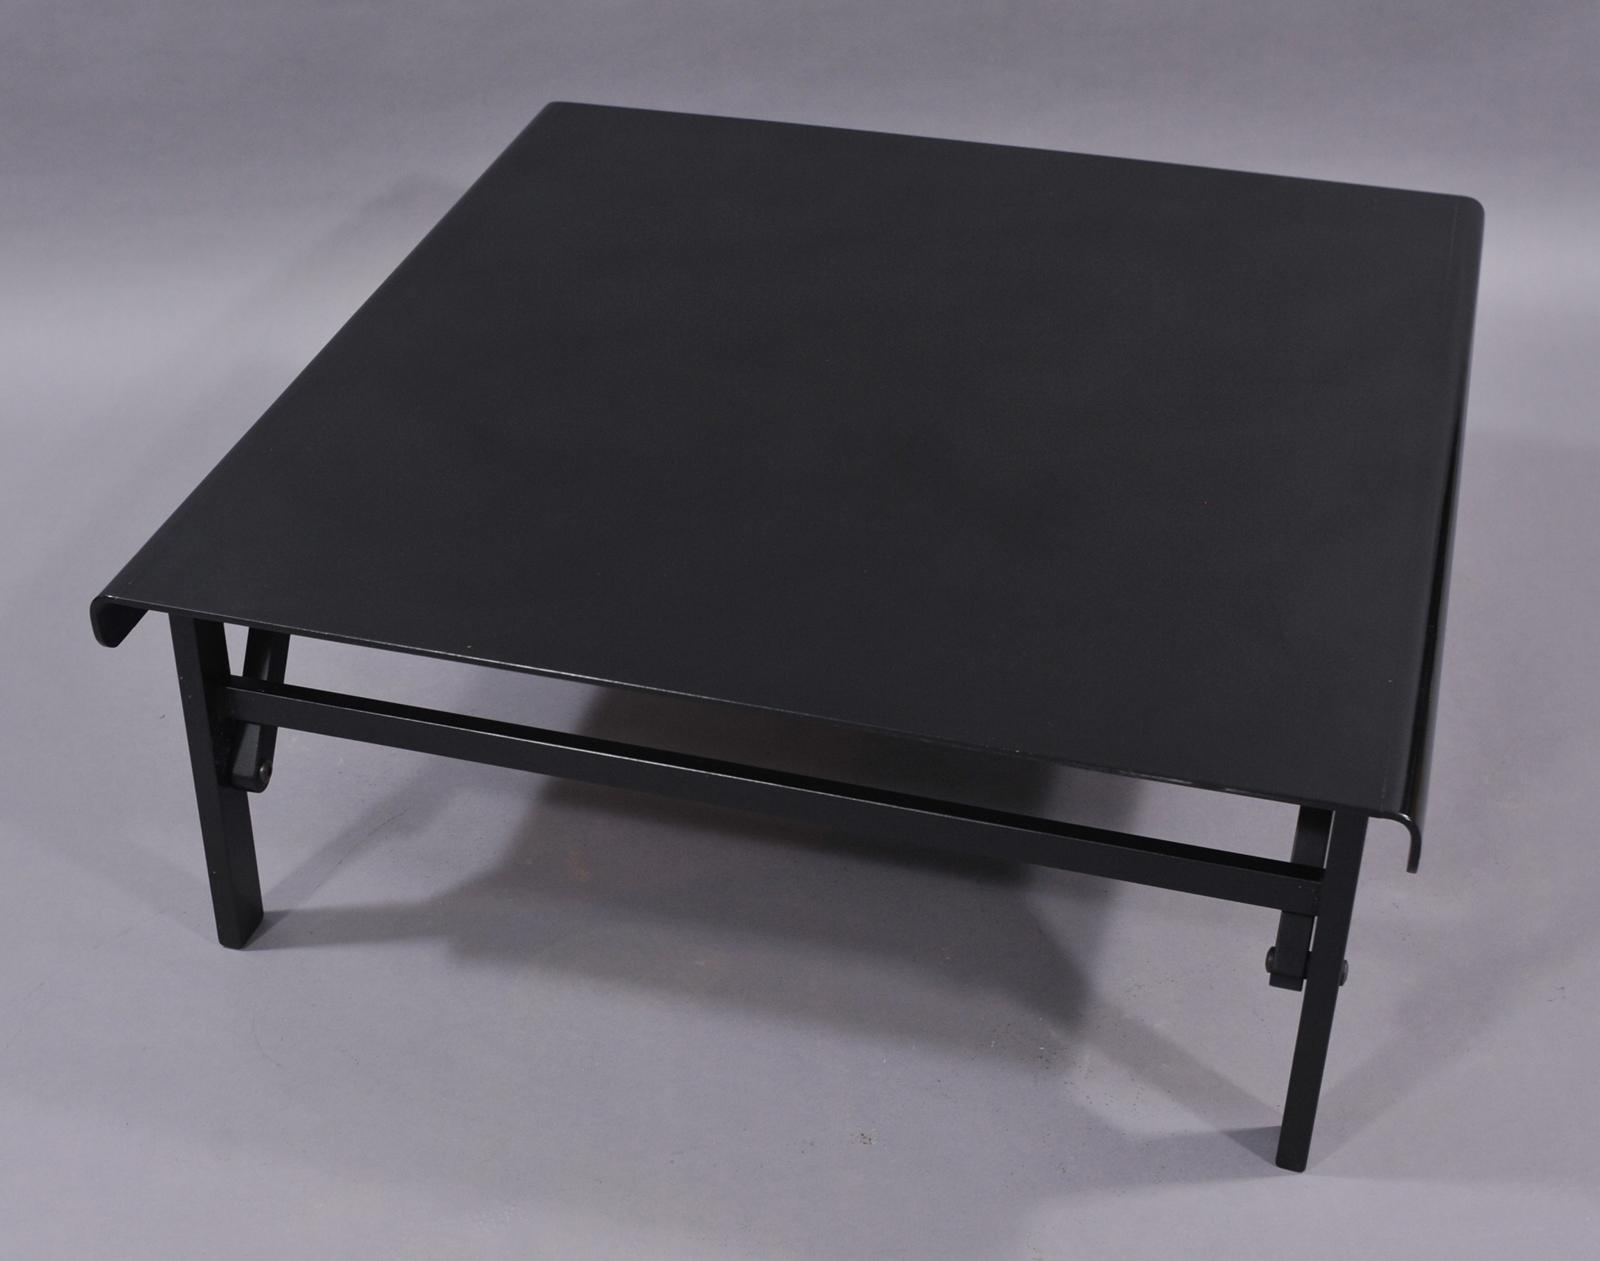 Table Basse Table Basse CastiglioniBbb BassAchille BonacinaModulolab BassAchille CtdshrQ